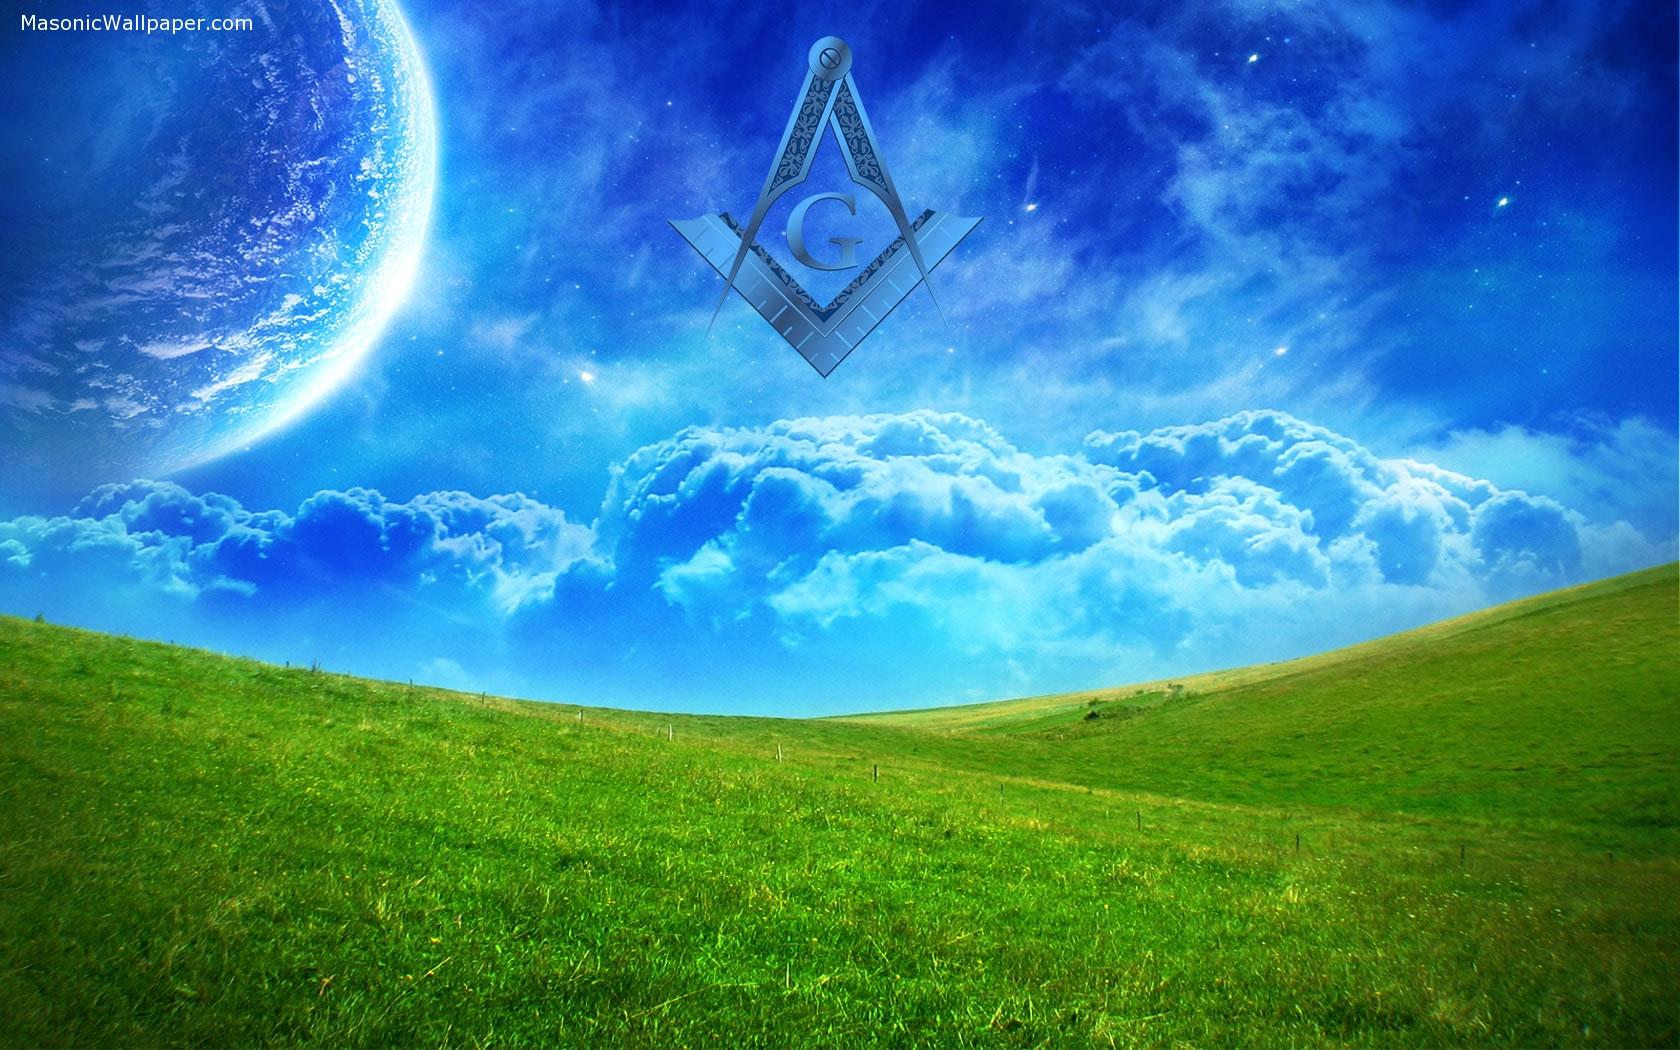 Masonic Desktop Wallpaper